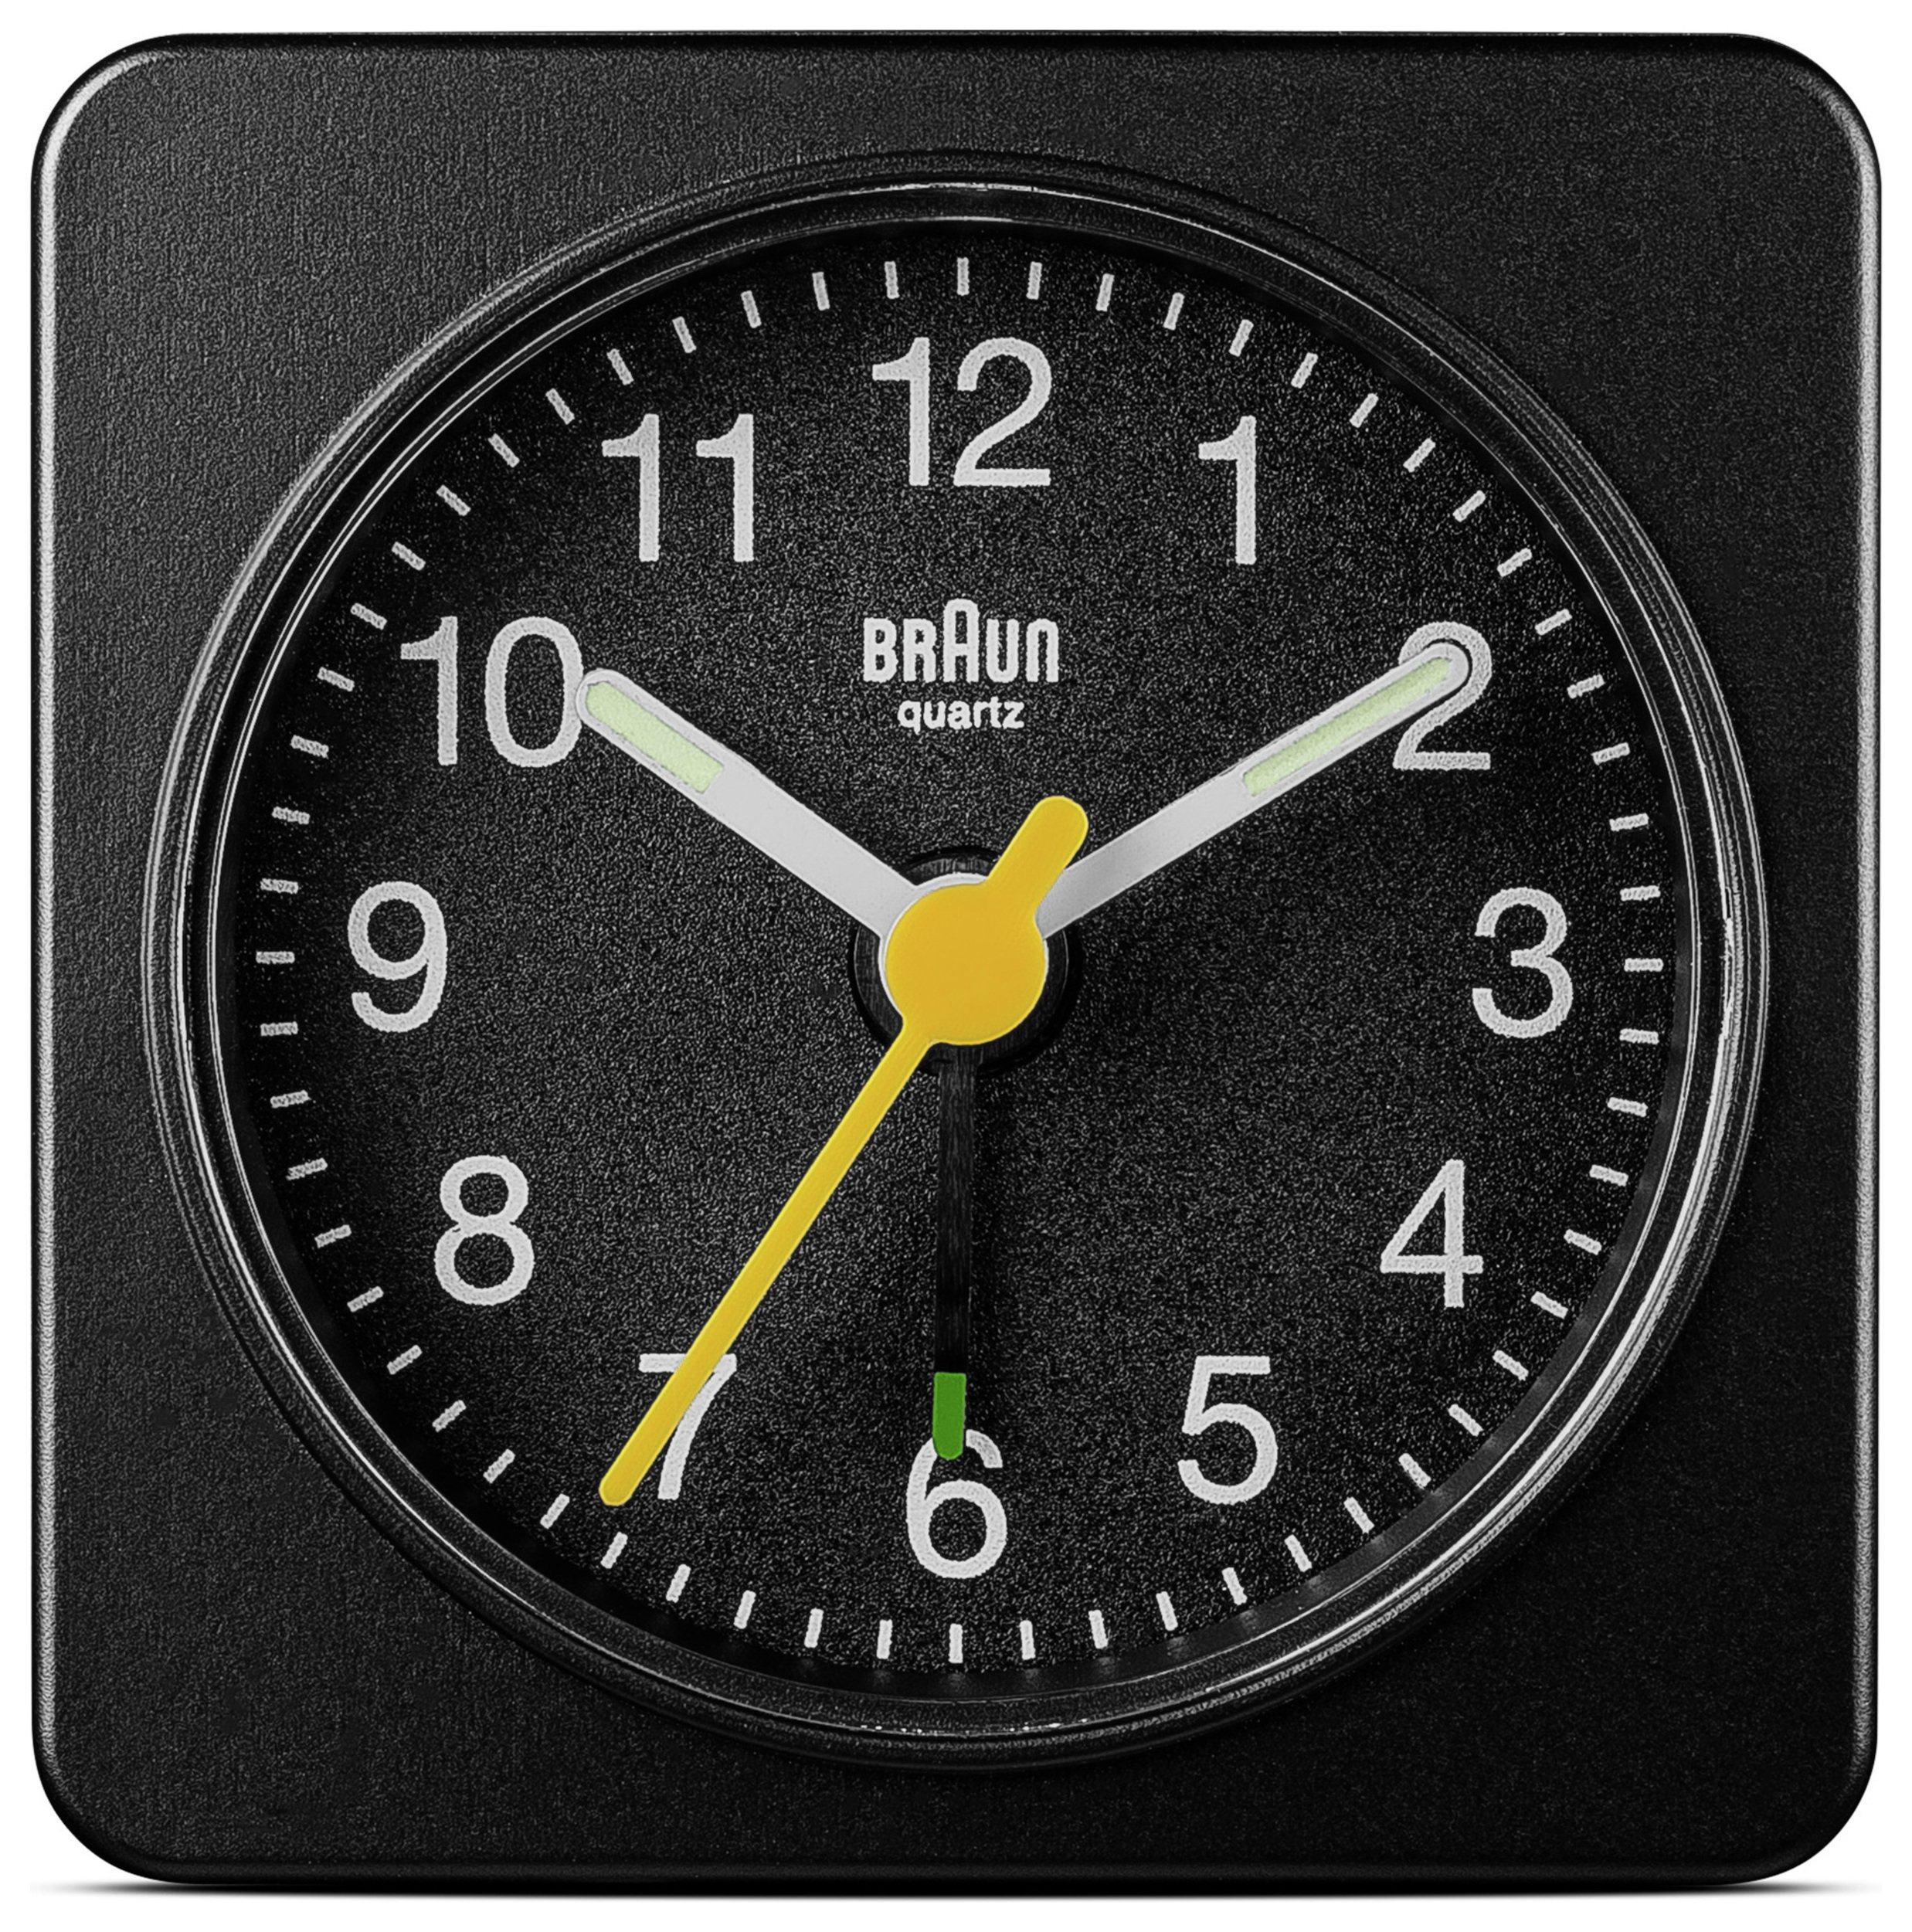 Braun Travel Alarm Clock - Black